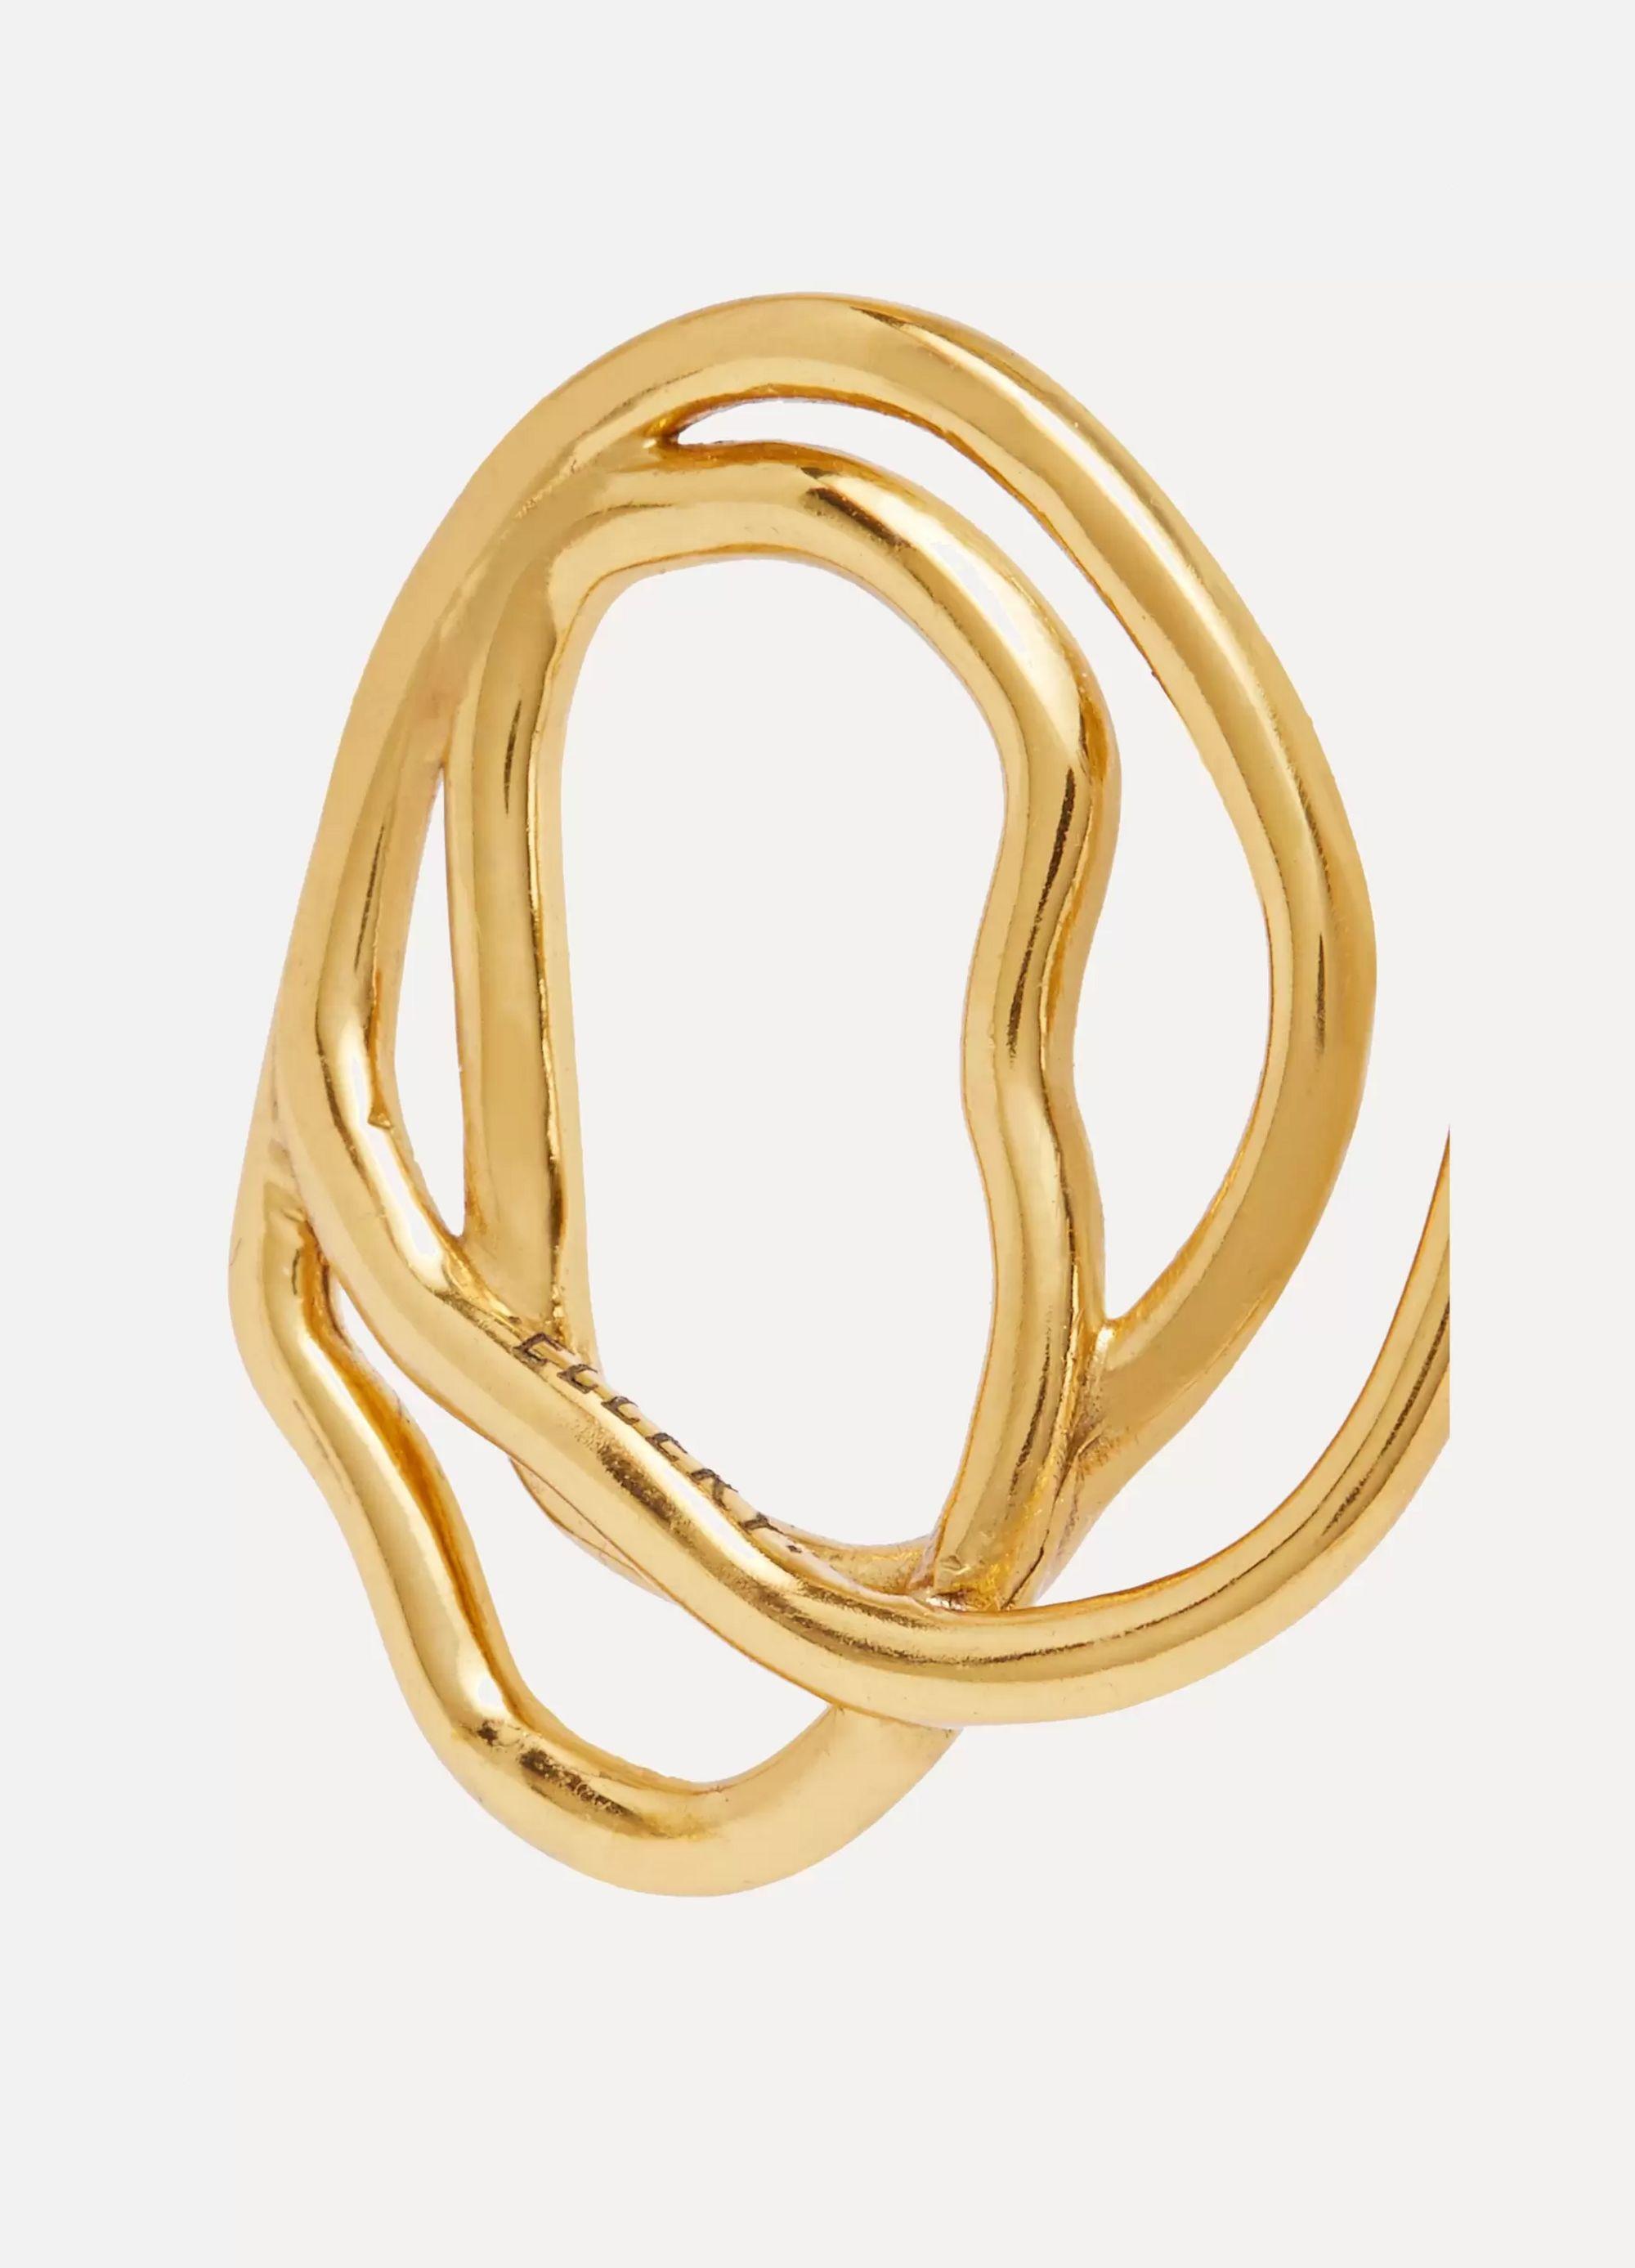 Ellery Forbidden Fruit gold-plated earrings